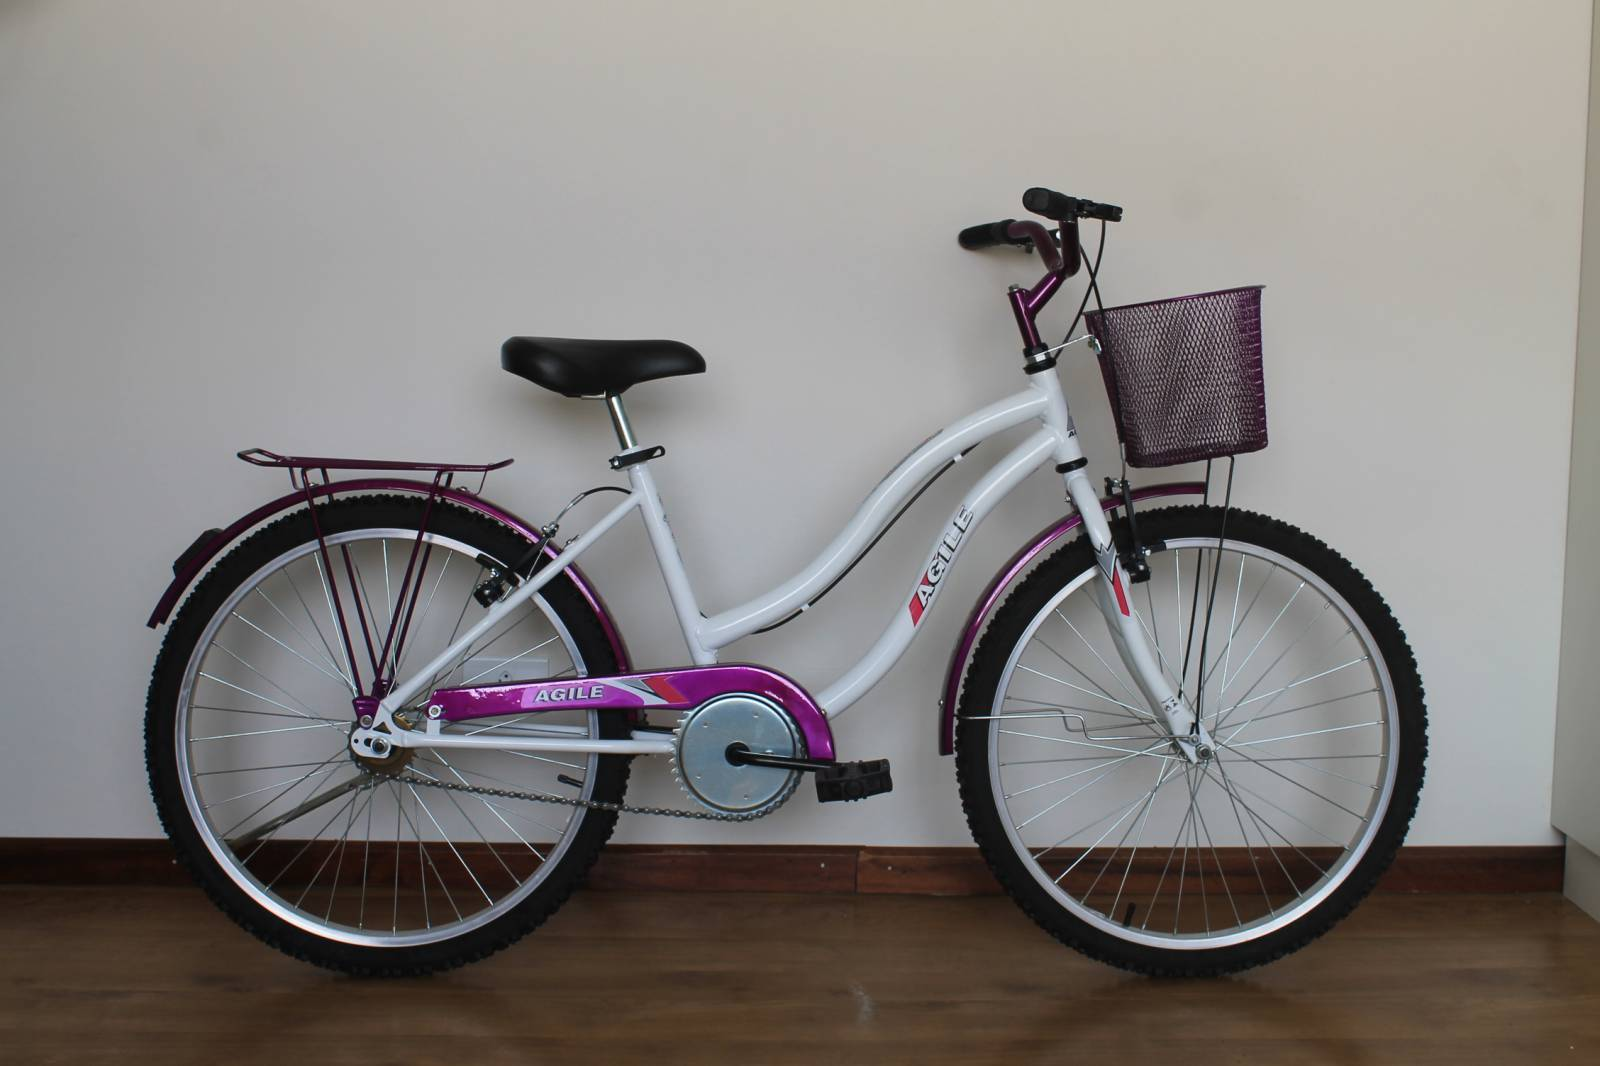 Bicicleta Agile Jad Aro 24 - Bike Portella